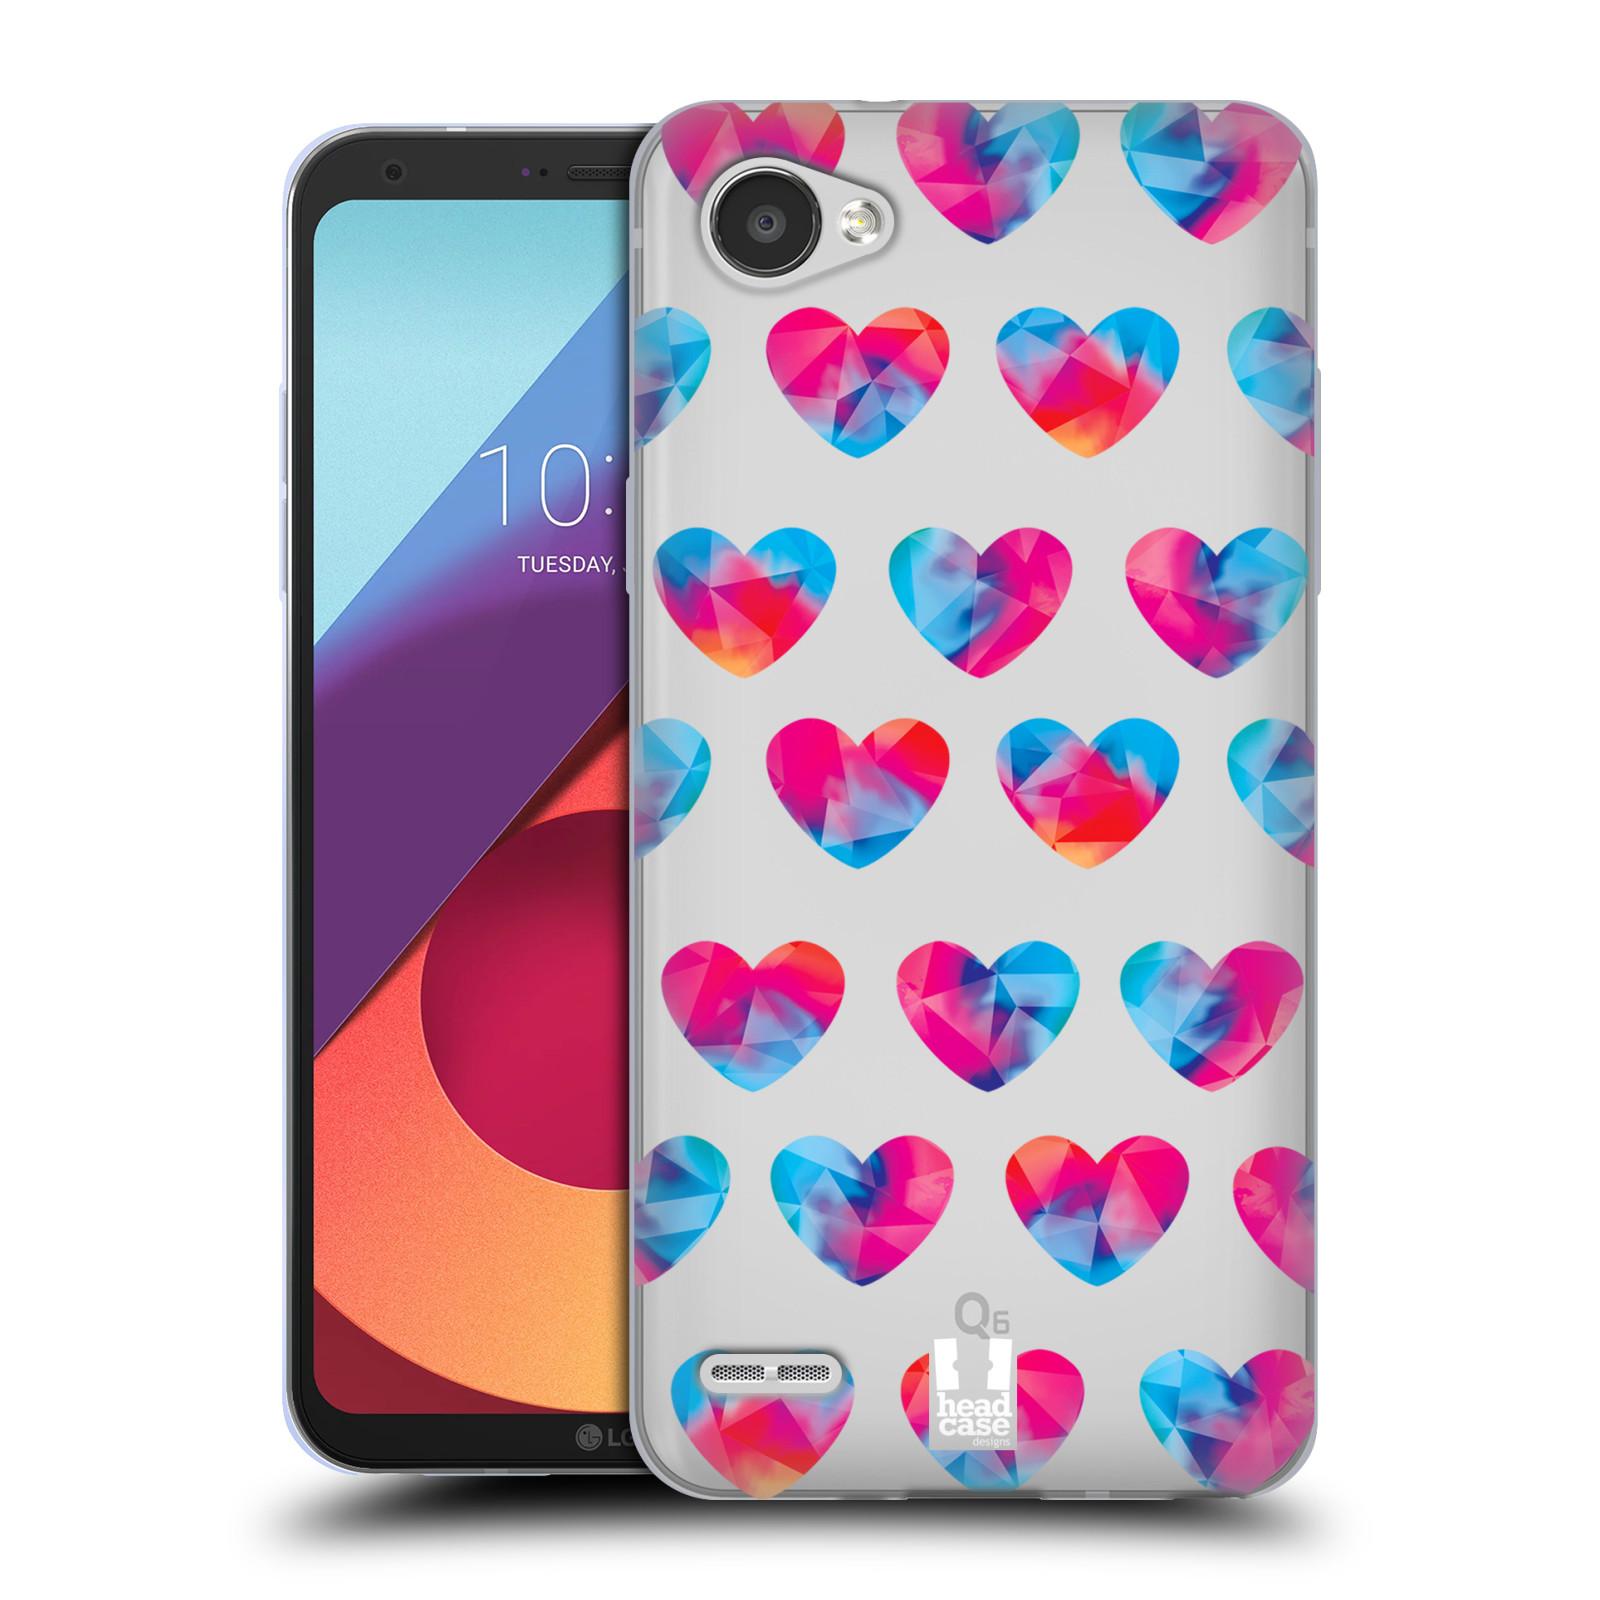 Silikonové pouzdro na mobil LG Q6 - Head Case - Srdíčka hrající barvami